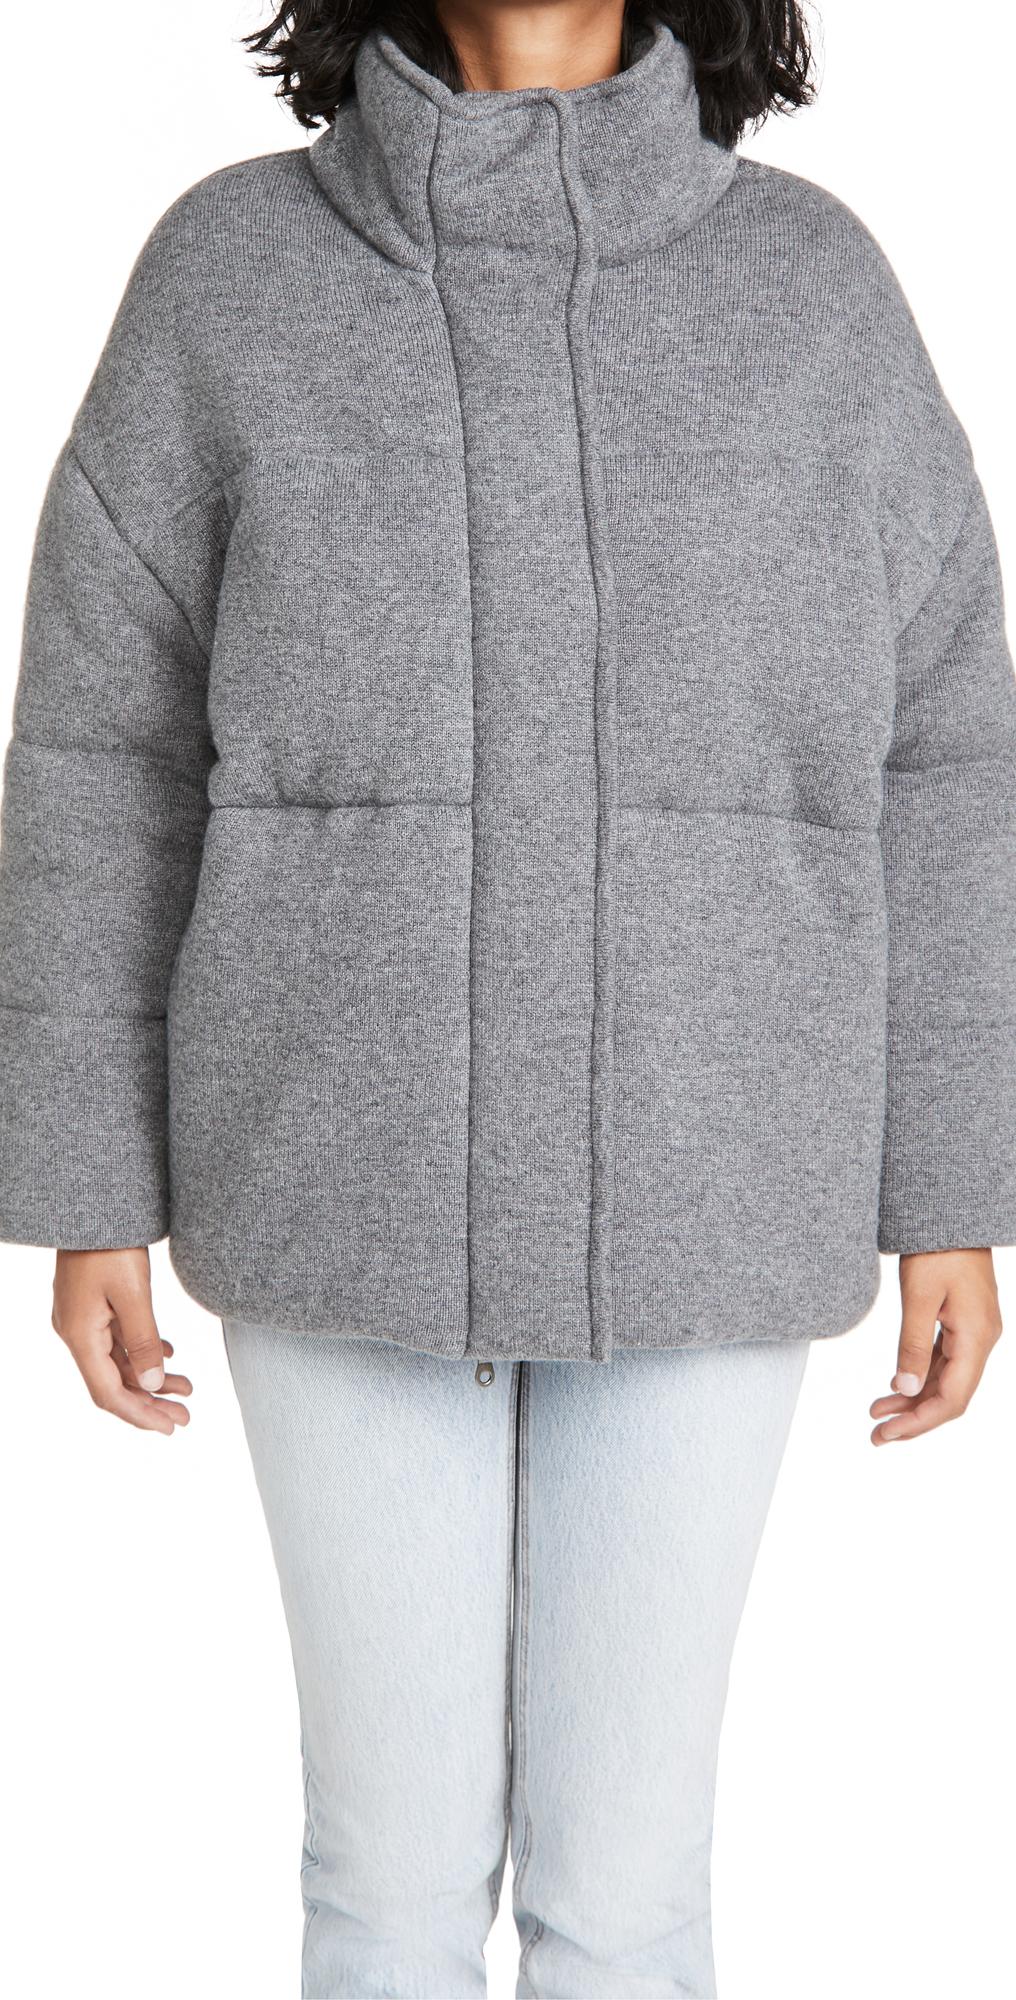 Dillon Cashmere Puffer Jacket